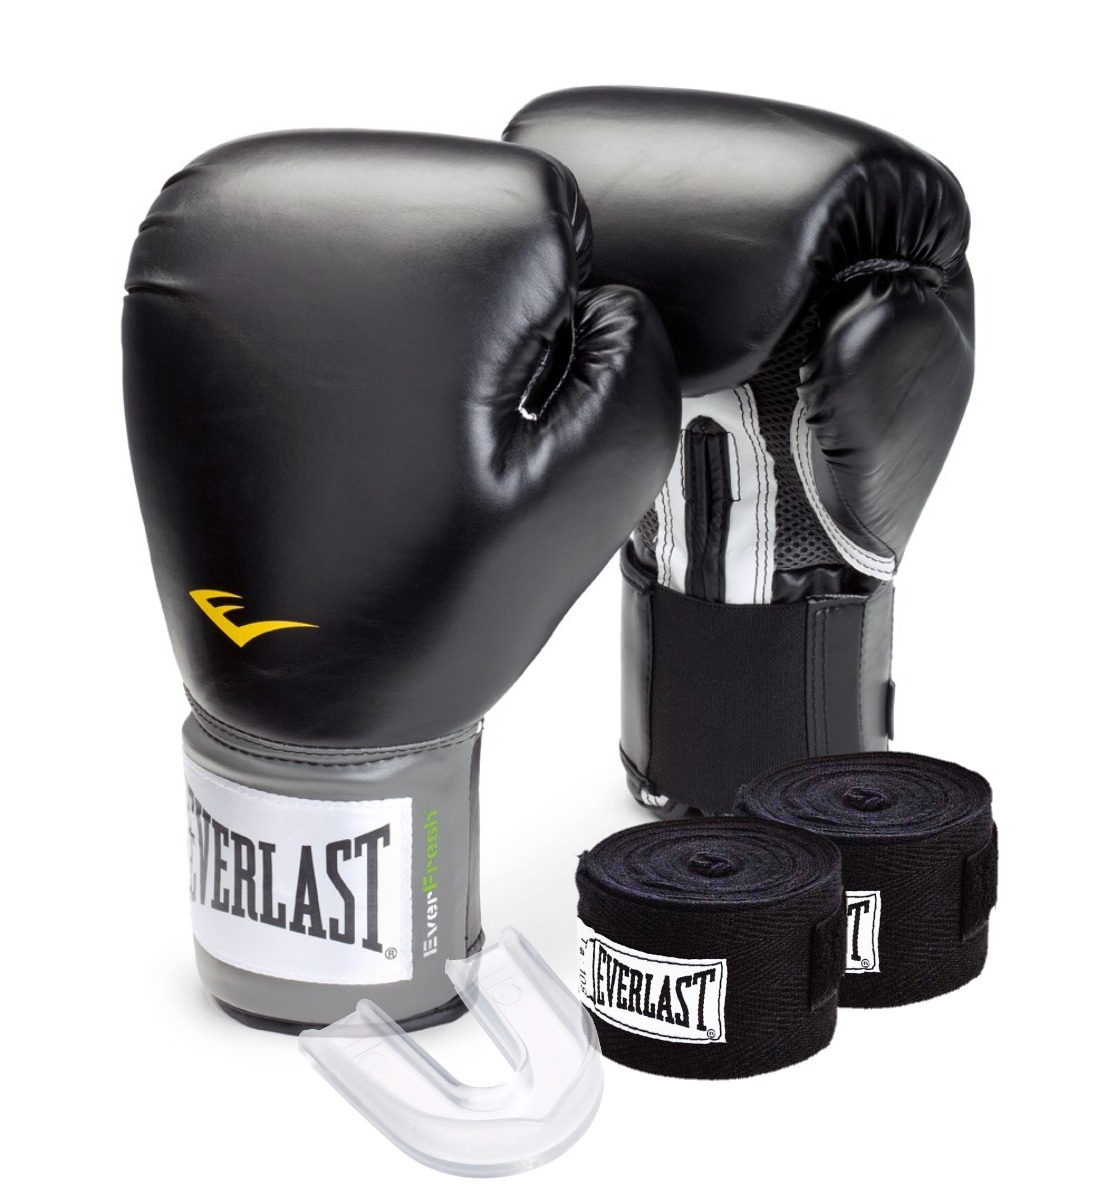 4daf50ca4 kit luva boxe   muay thai - training everlast - preto. Carregando zoom.